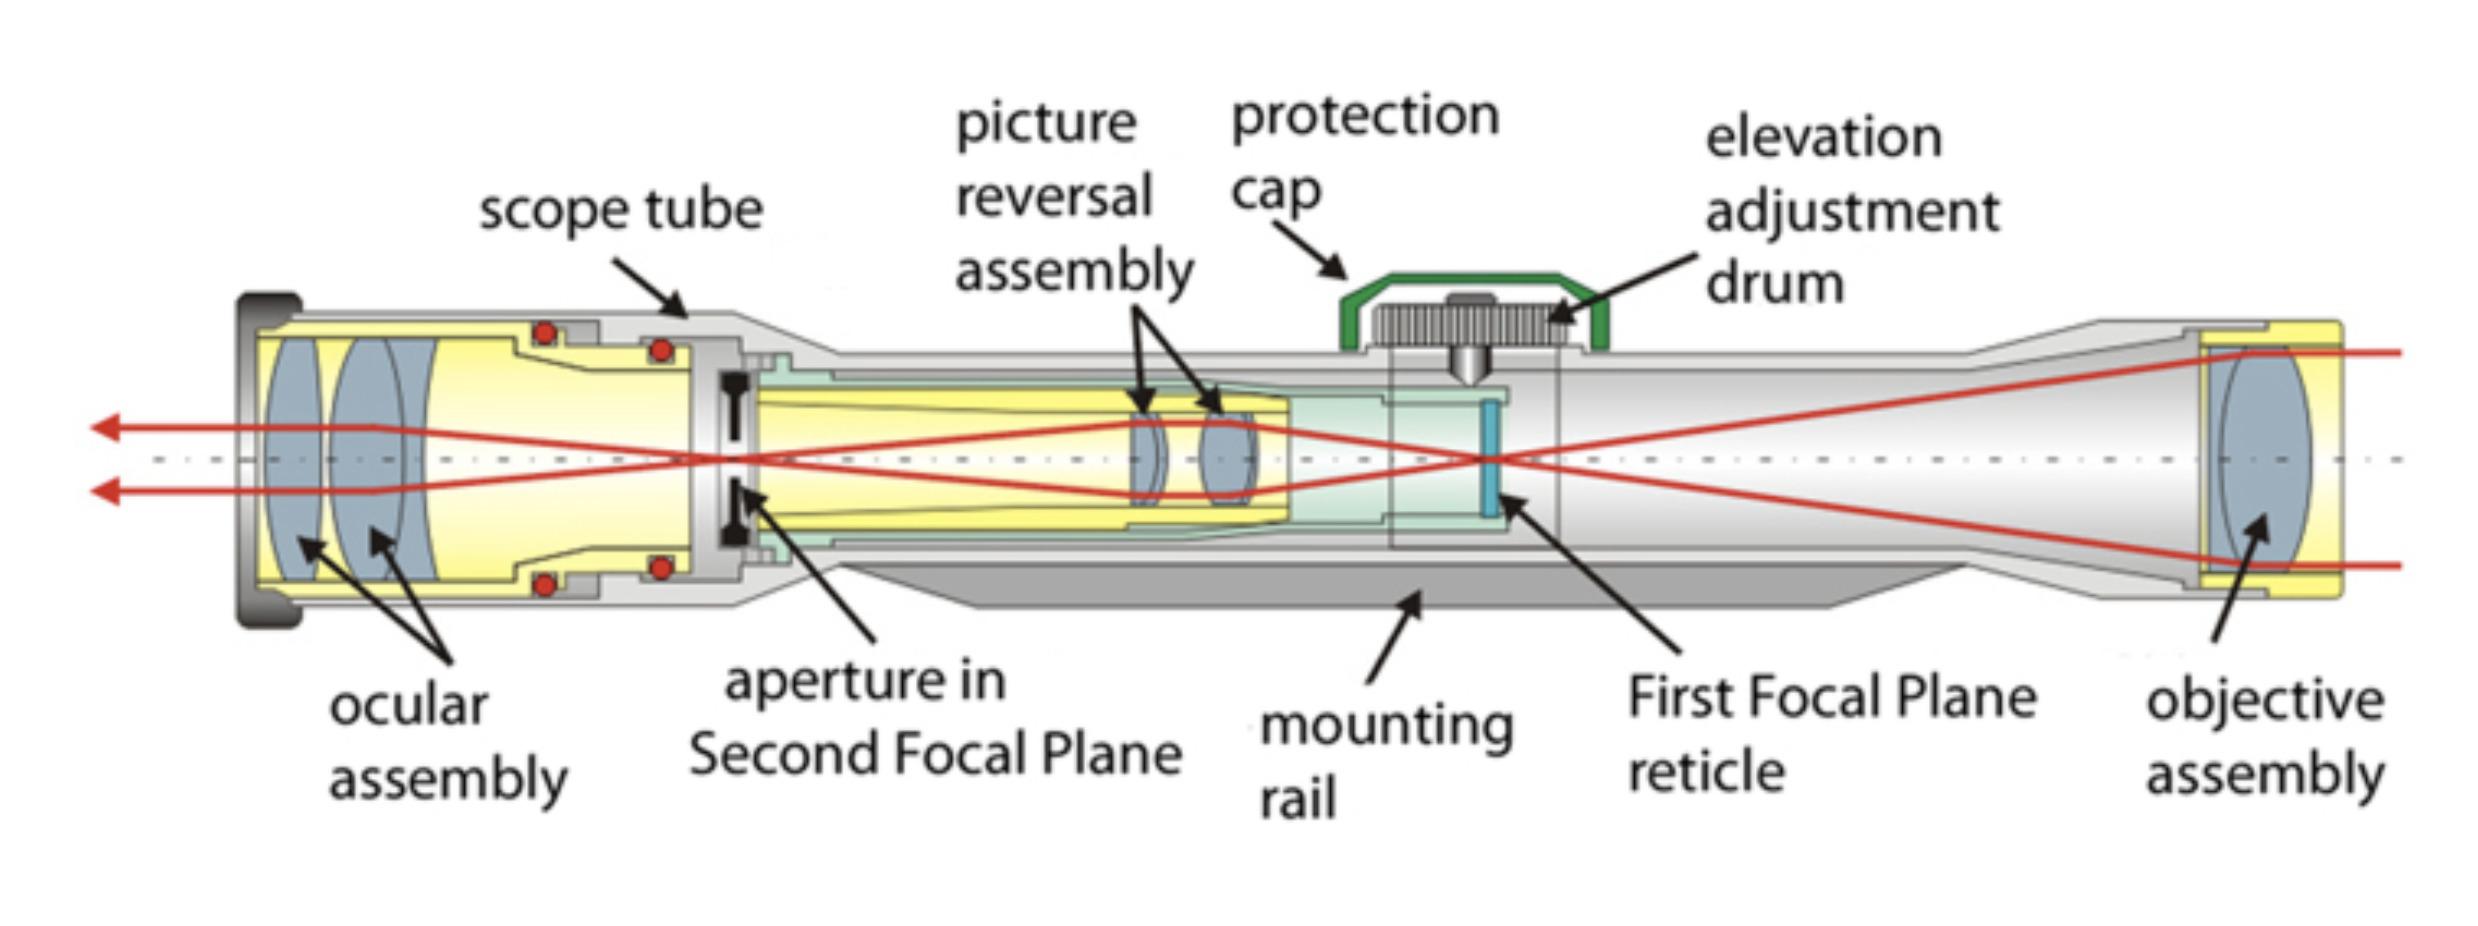 Longer Scopes have Better Optical Quality